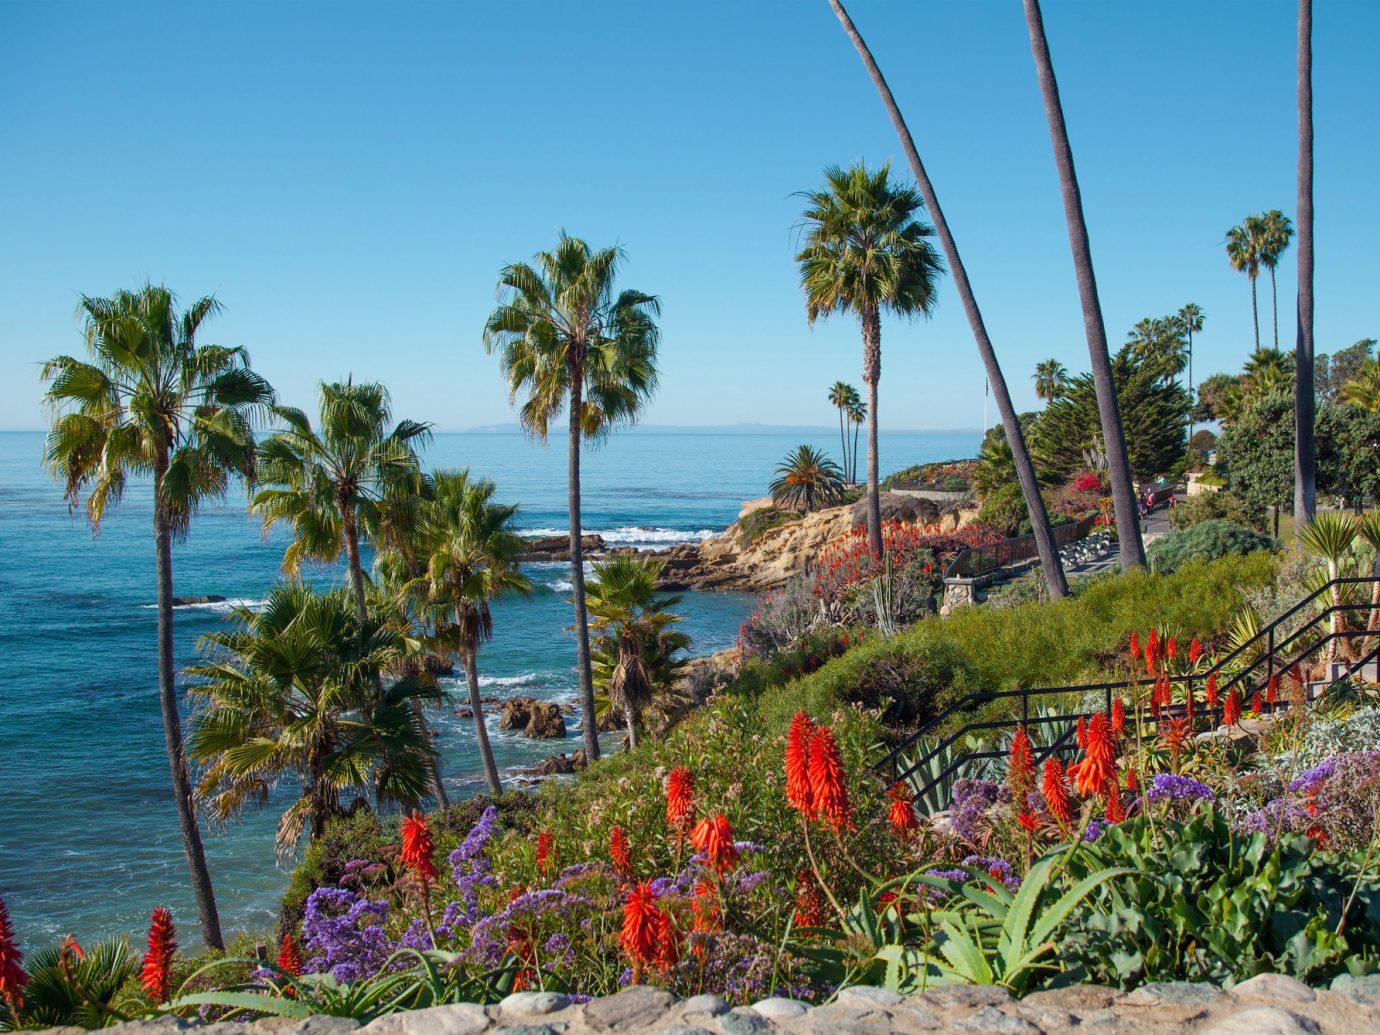 Trip Ideas sky outdoor tree palm flora Beach Coast vacation Sea plant arecales tropics caribbean Ocean bay flower Resort colorful Garden lined